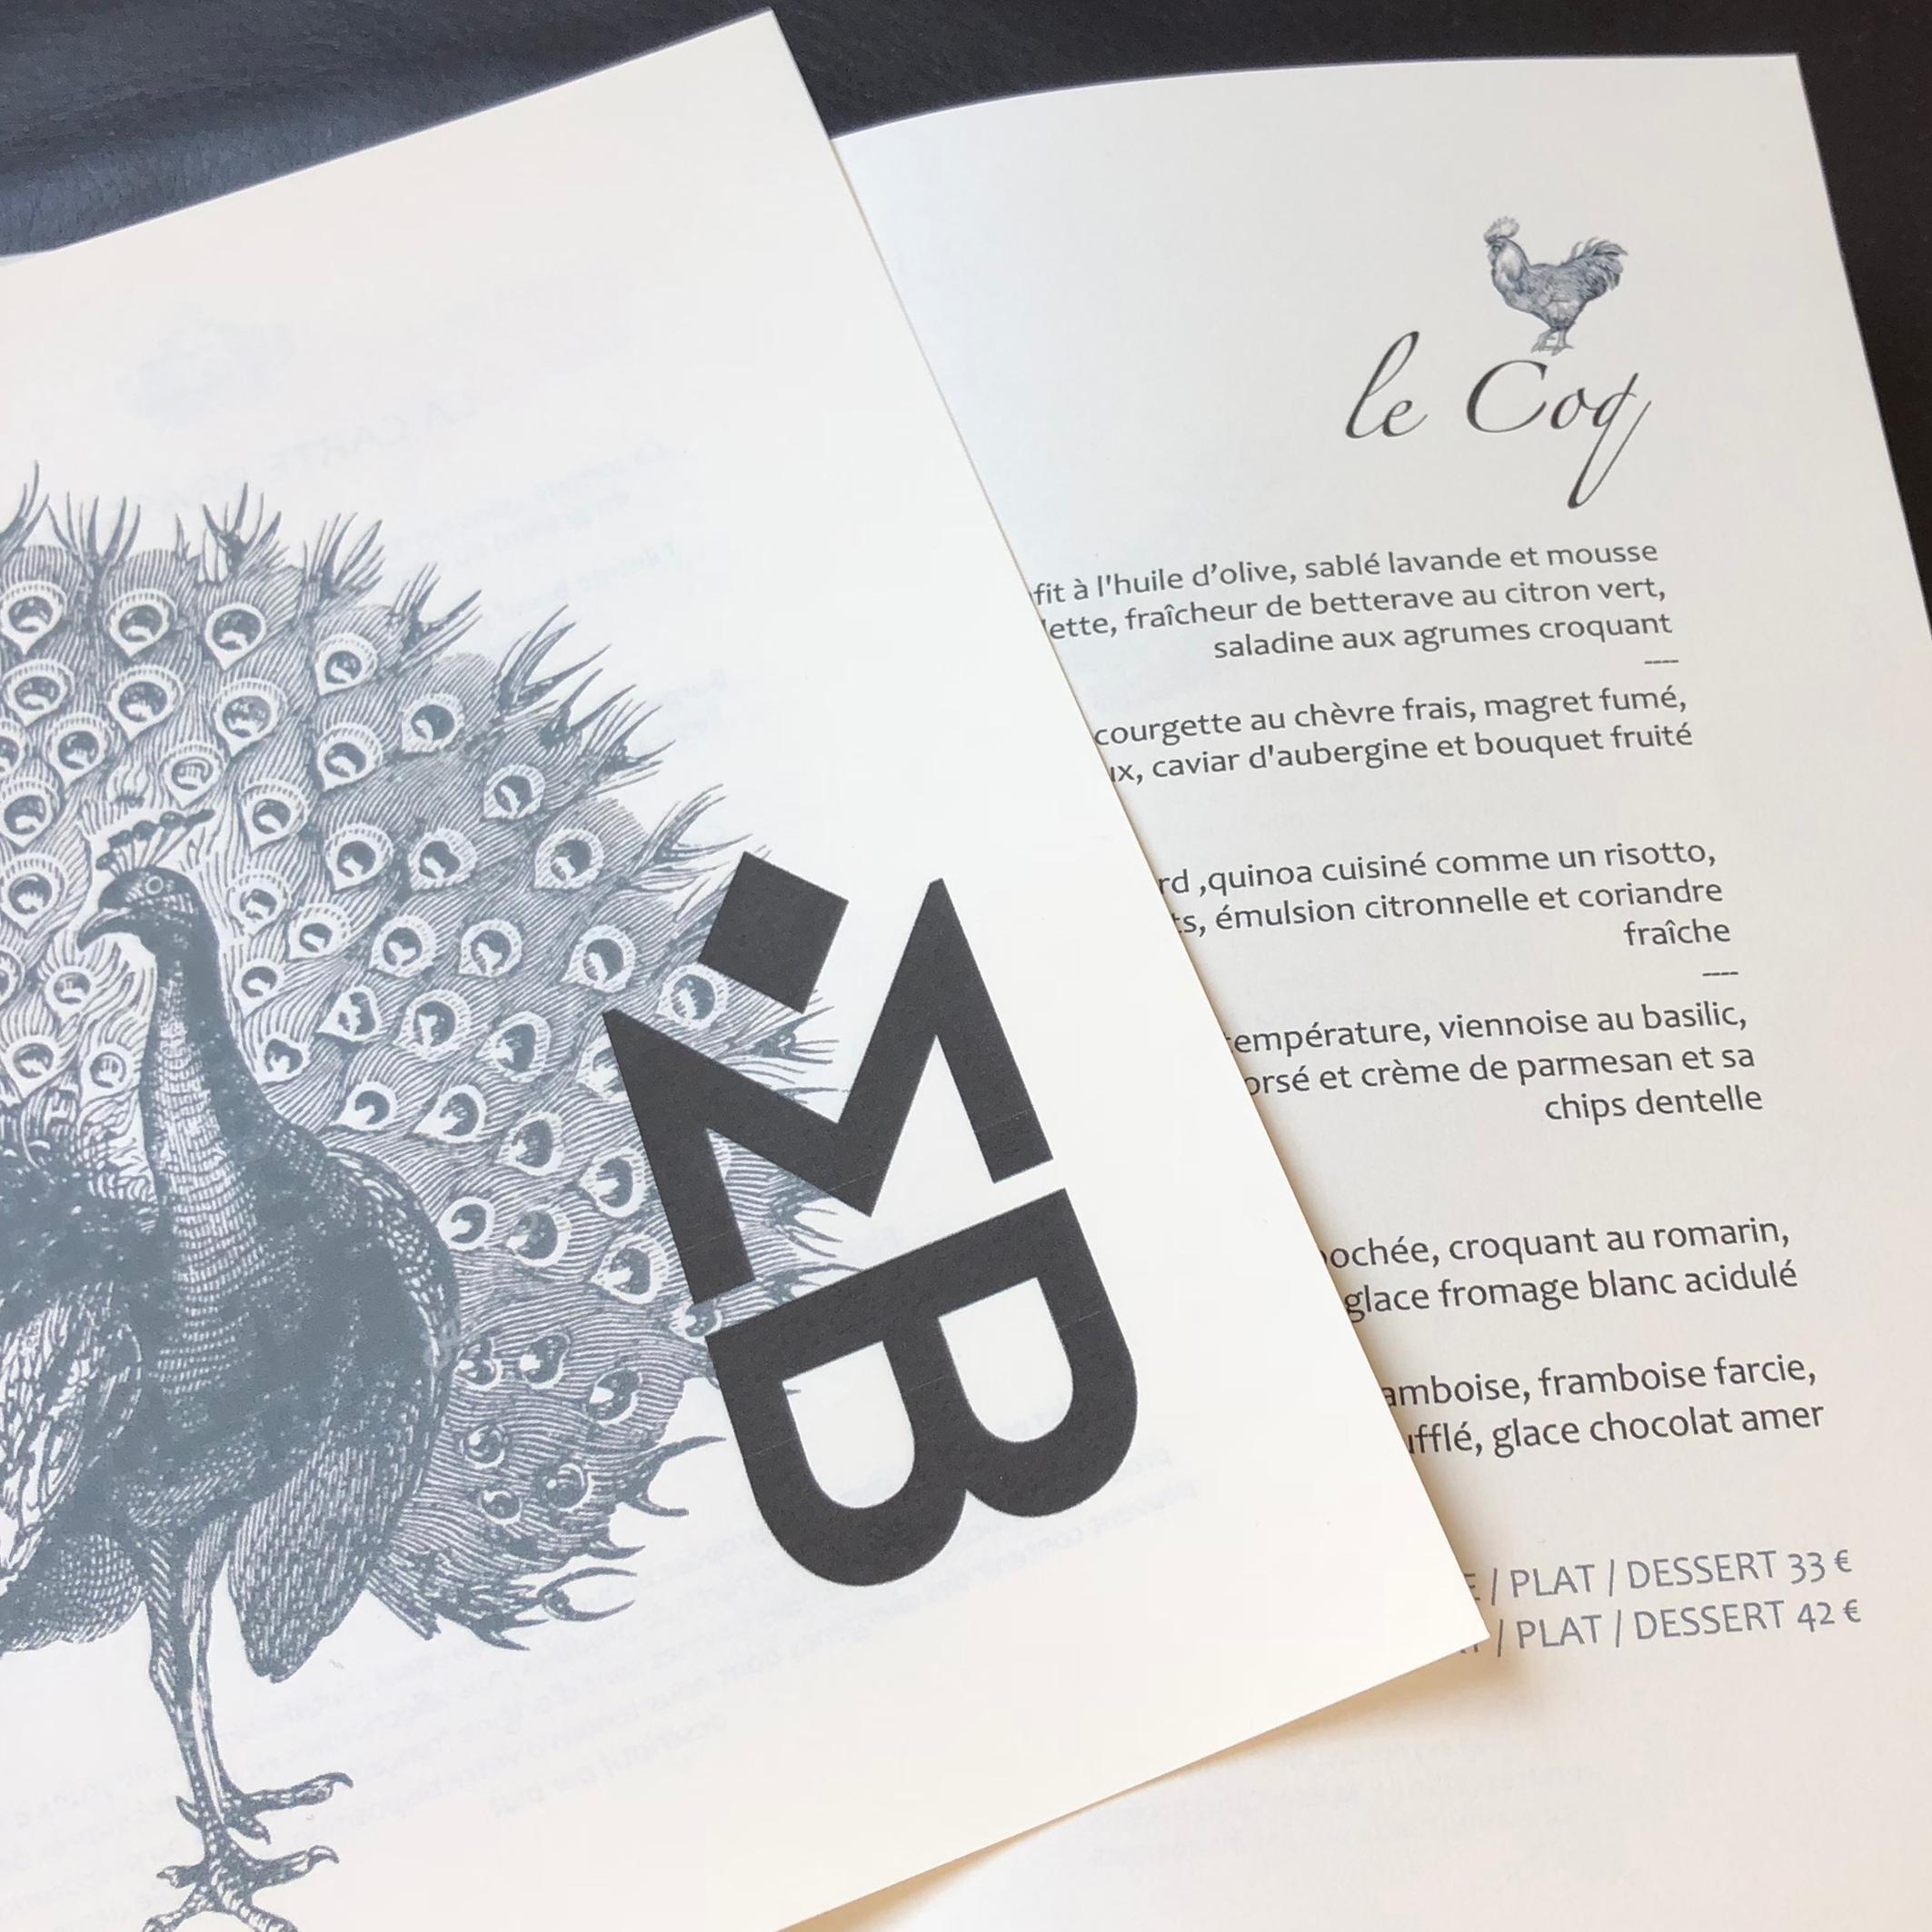 maison bouquet vikiu design logo mb menu coq